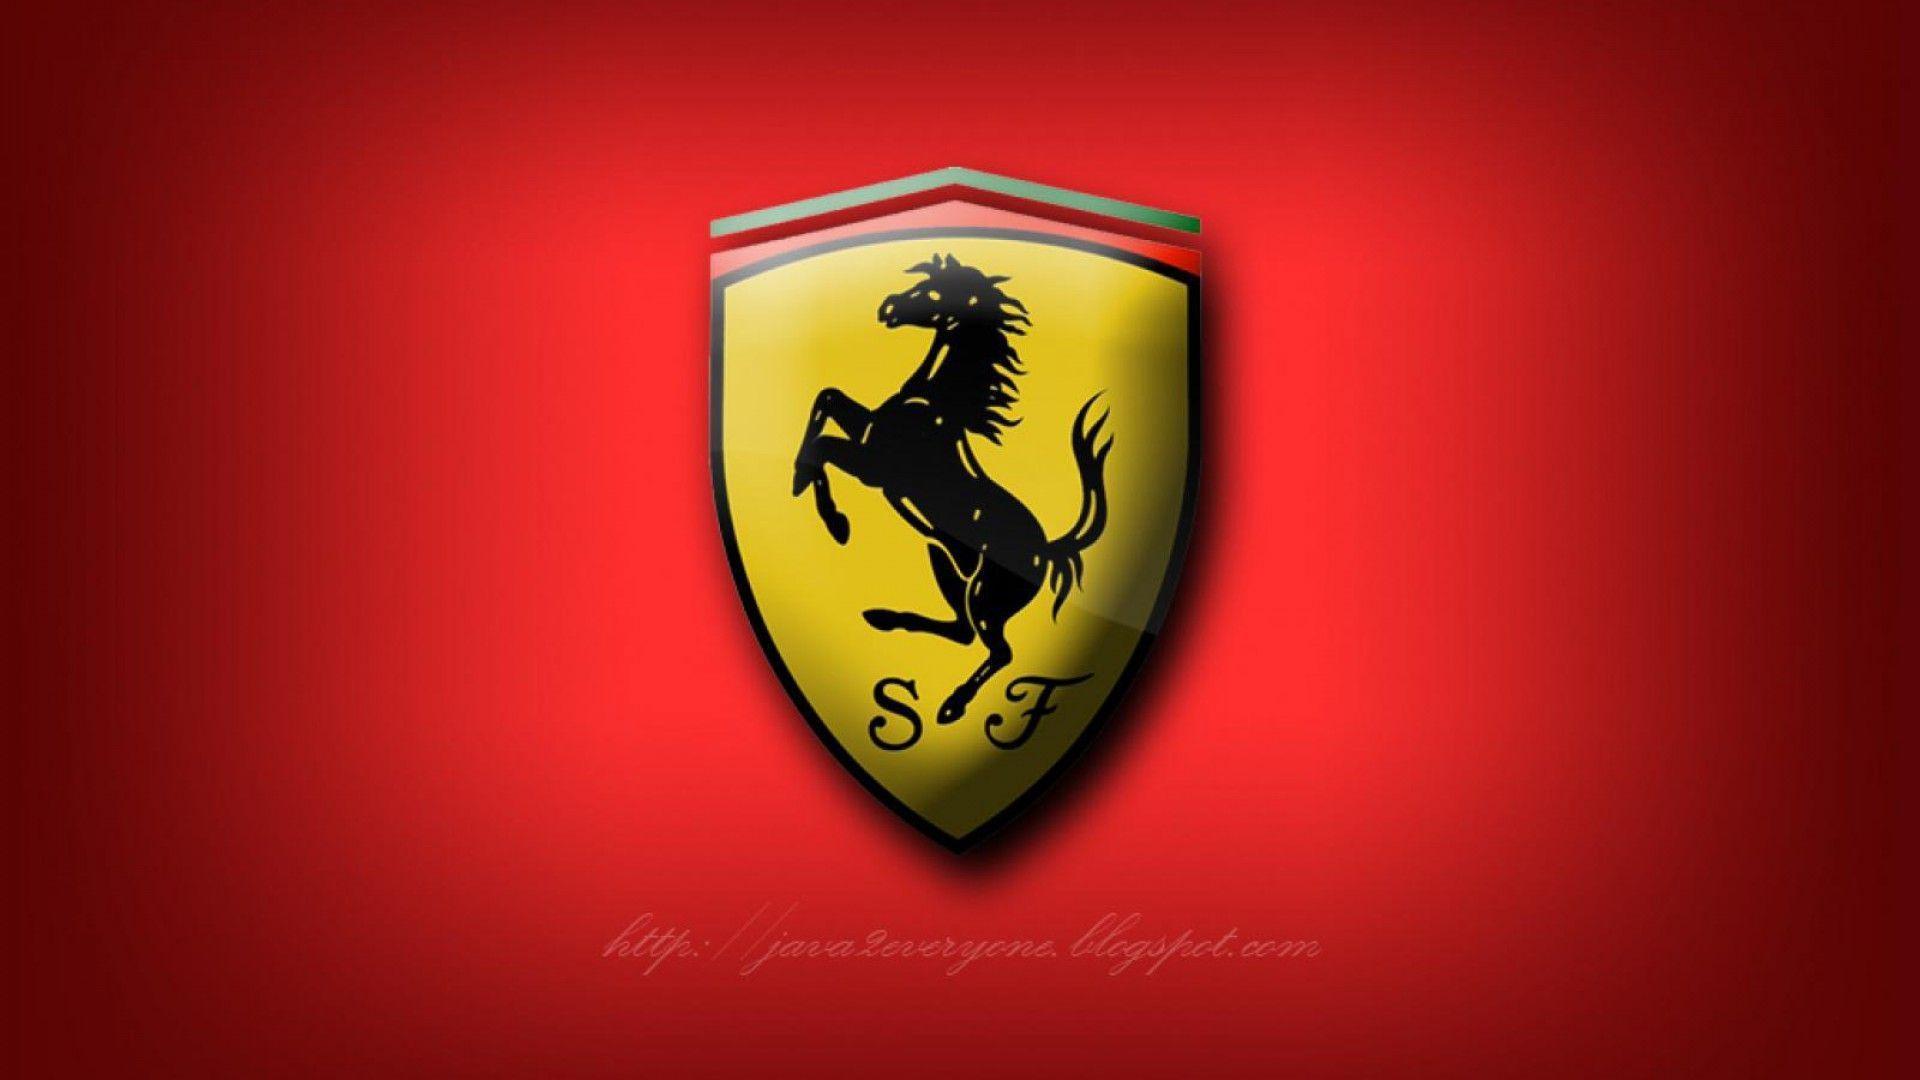 Ferrari Logo Wallpaper - Wallpaper And Background